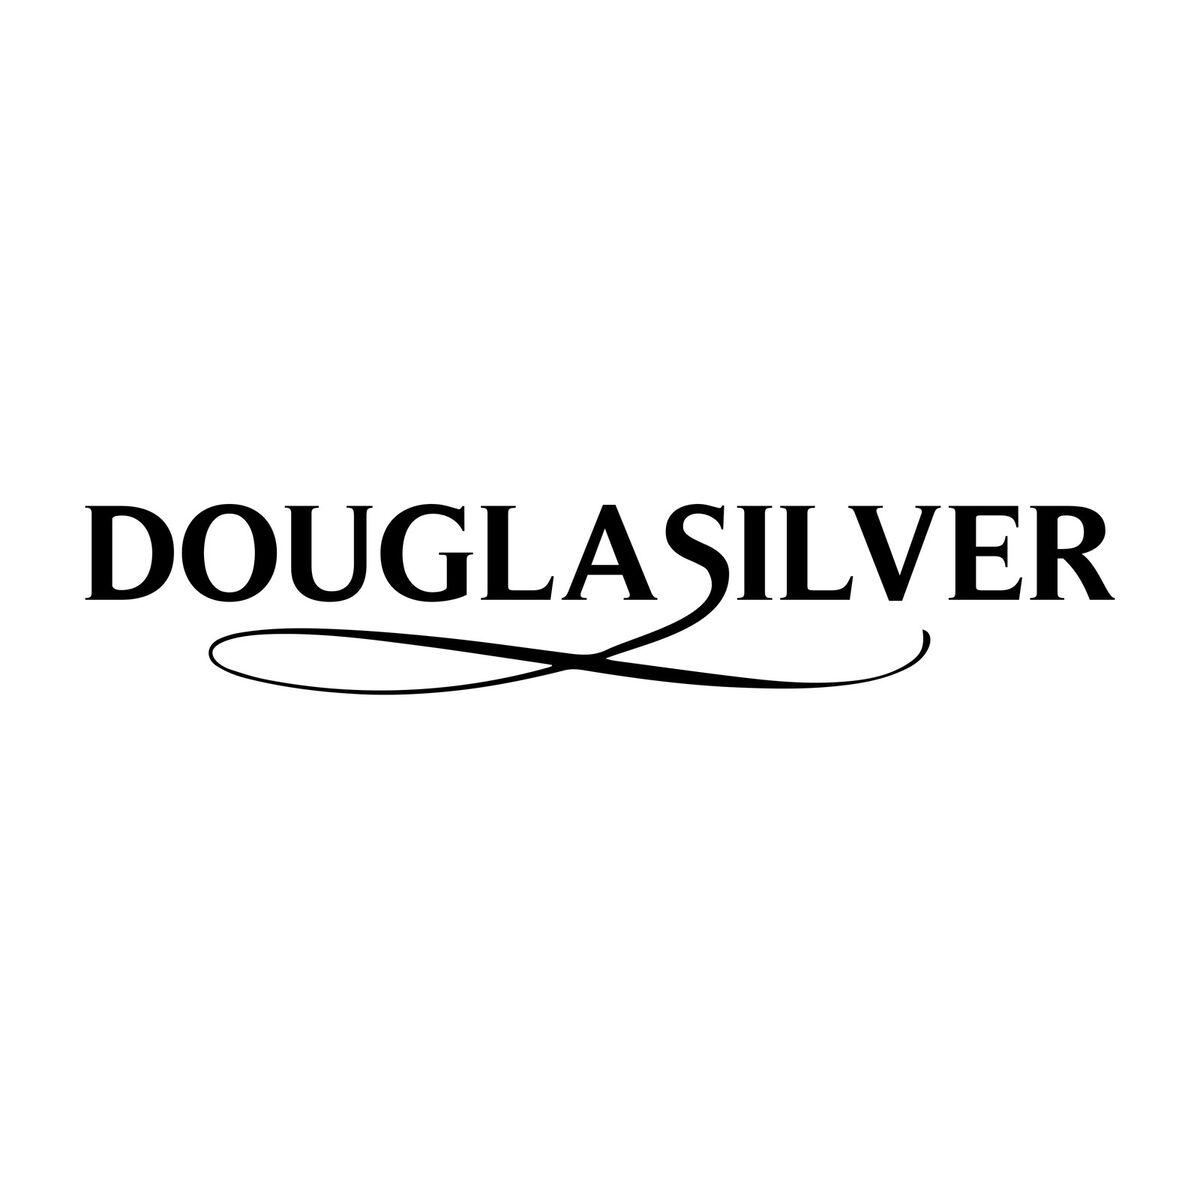 DOUGLASILVER LLC